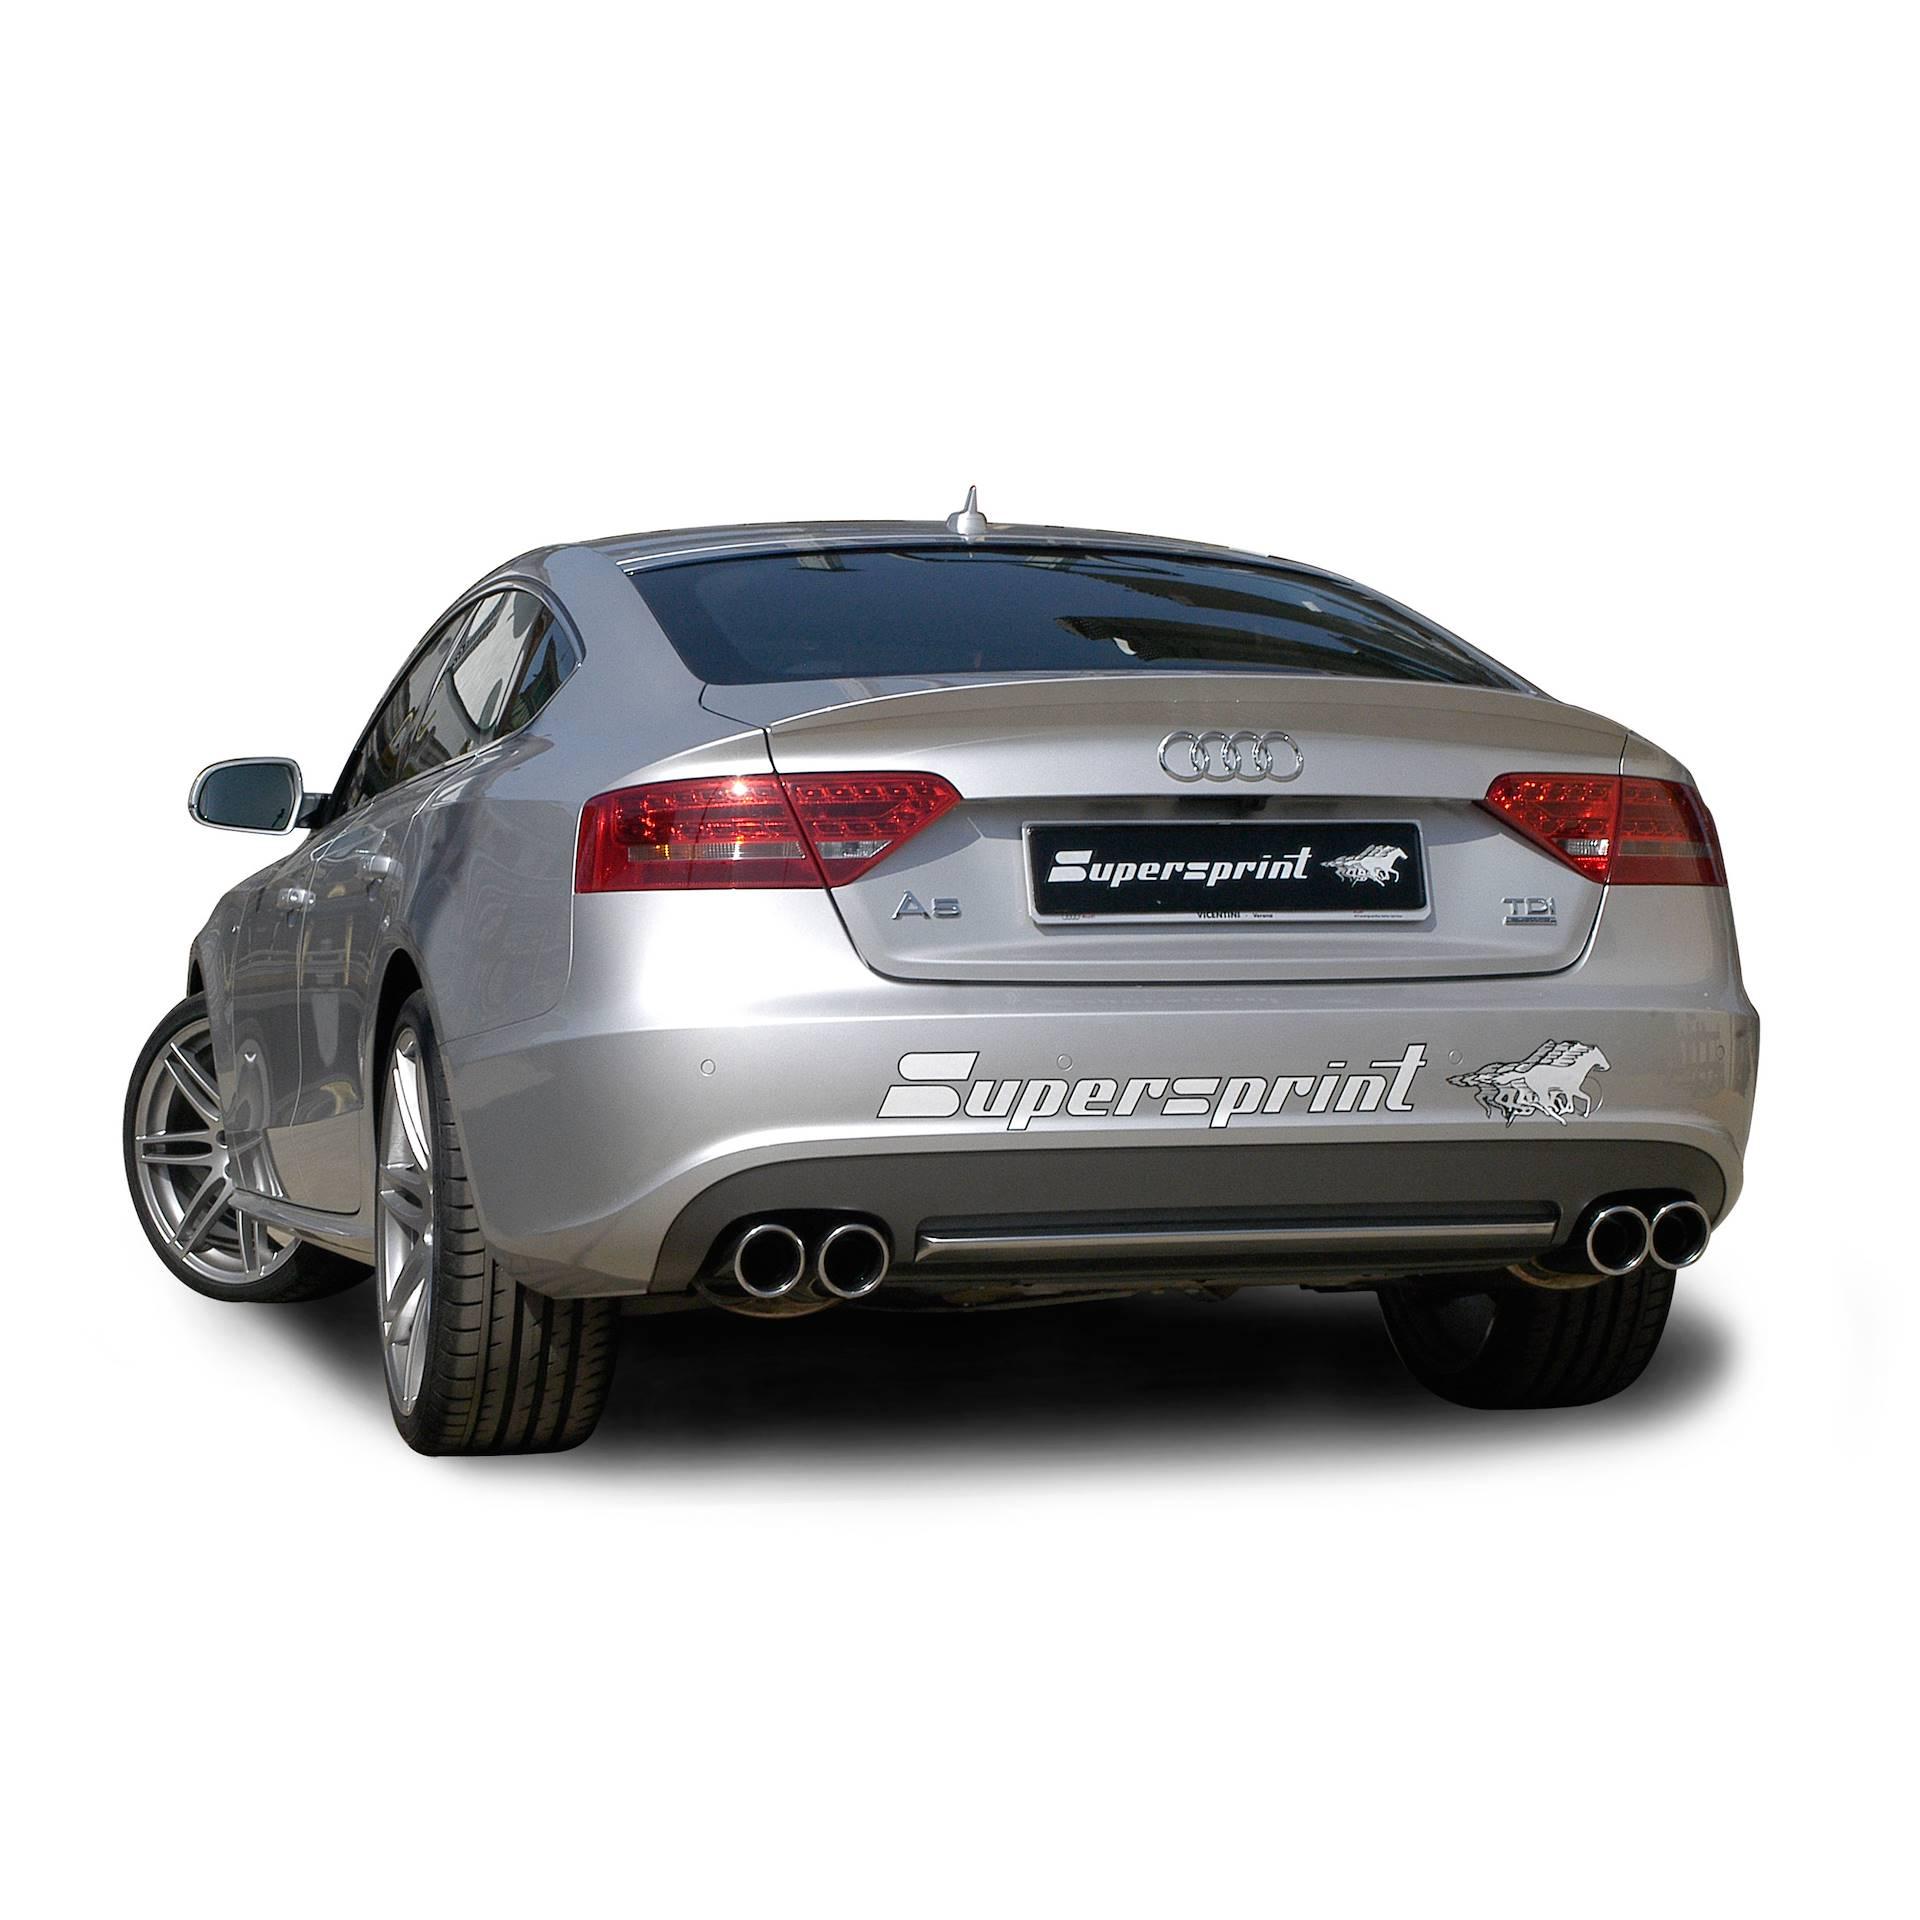 Audi A5 Sportback 2 0 Tdi 143 150 163 170 177 190 Hp 09 Gt Audi Syst 232 Mes D